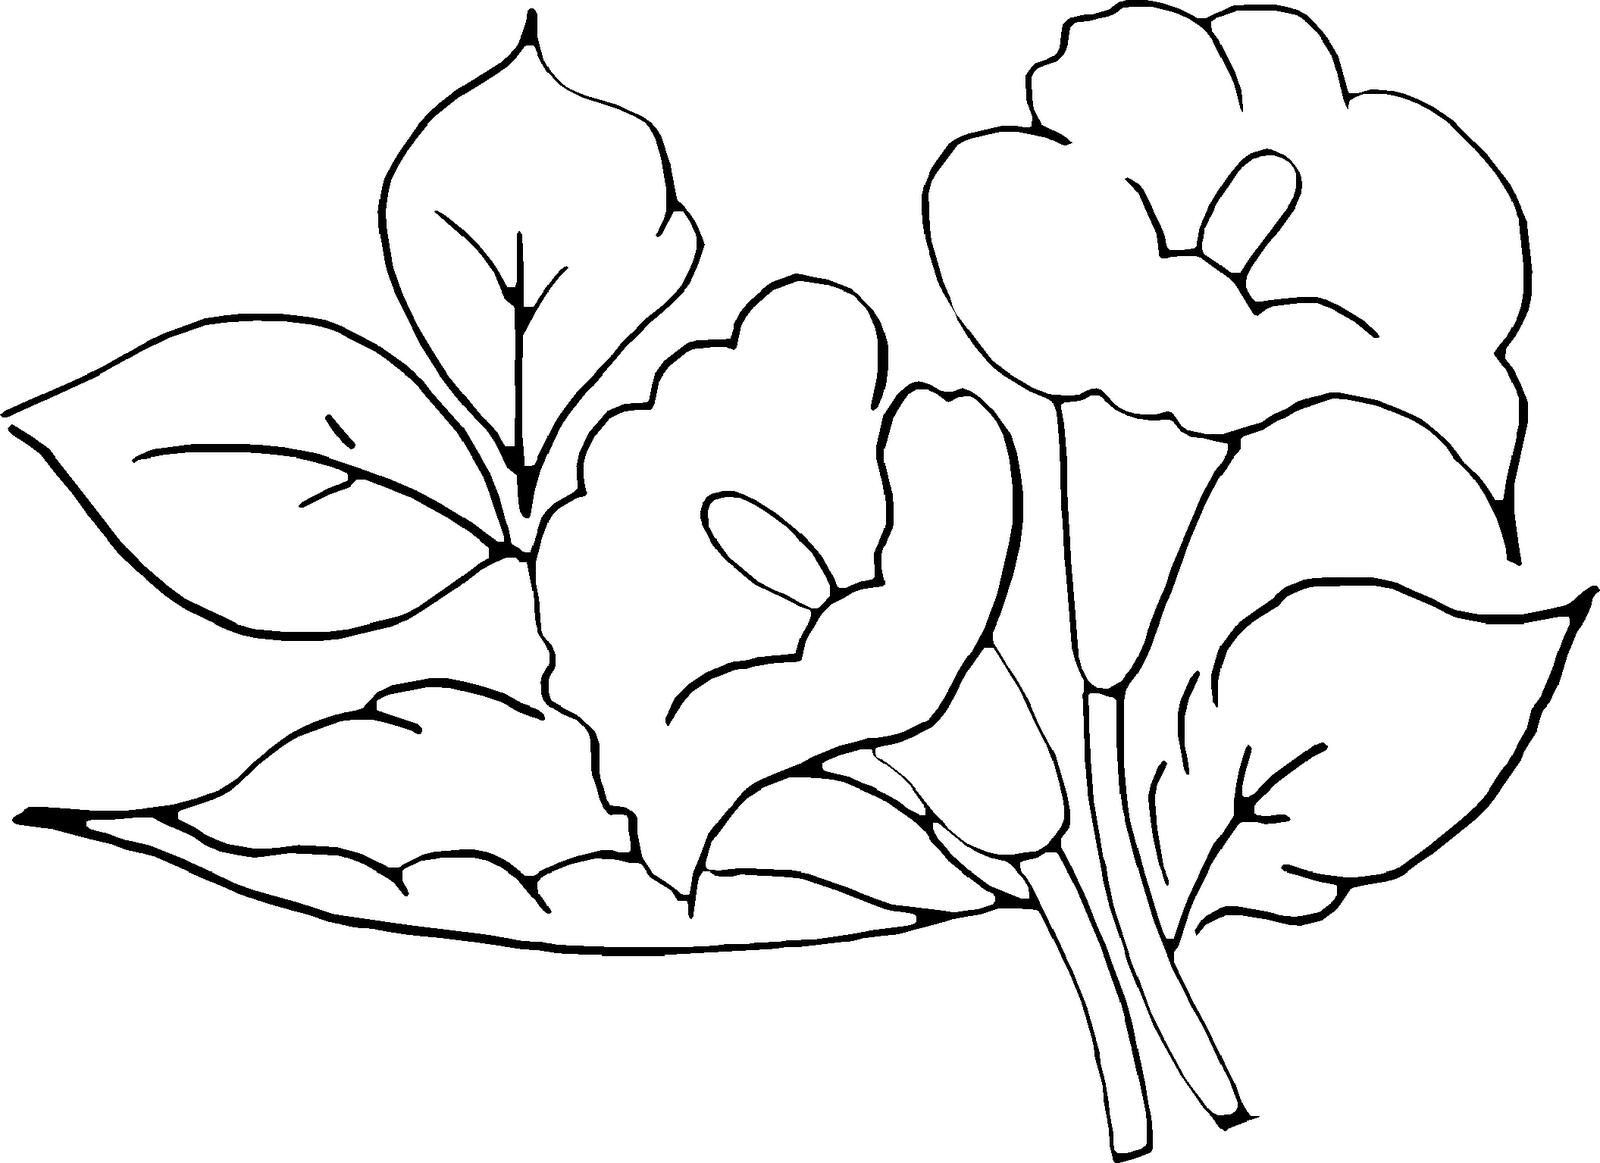 pinterest flores | fotos de flores para pintar - fotos de flores ...